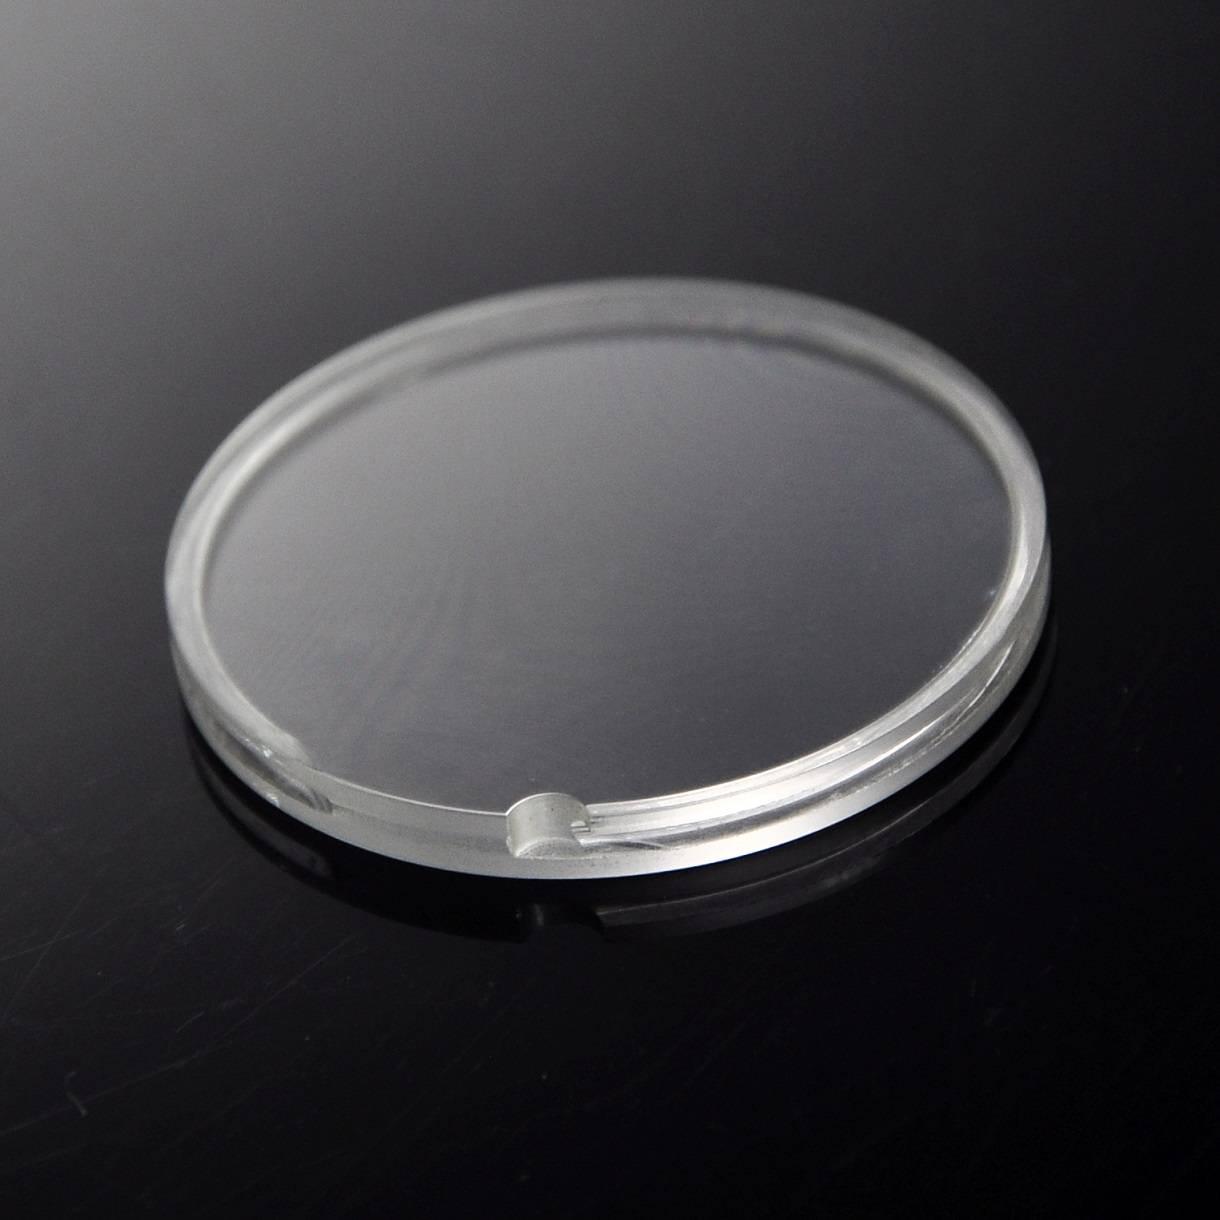 Sapphire optical glass